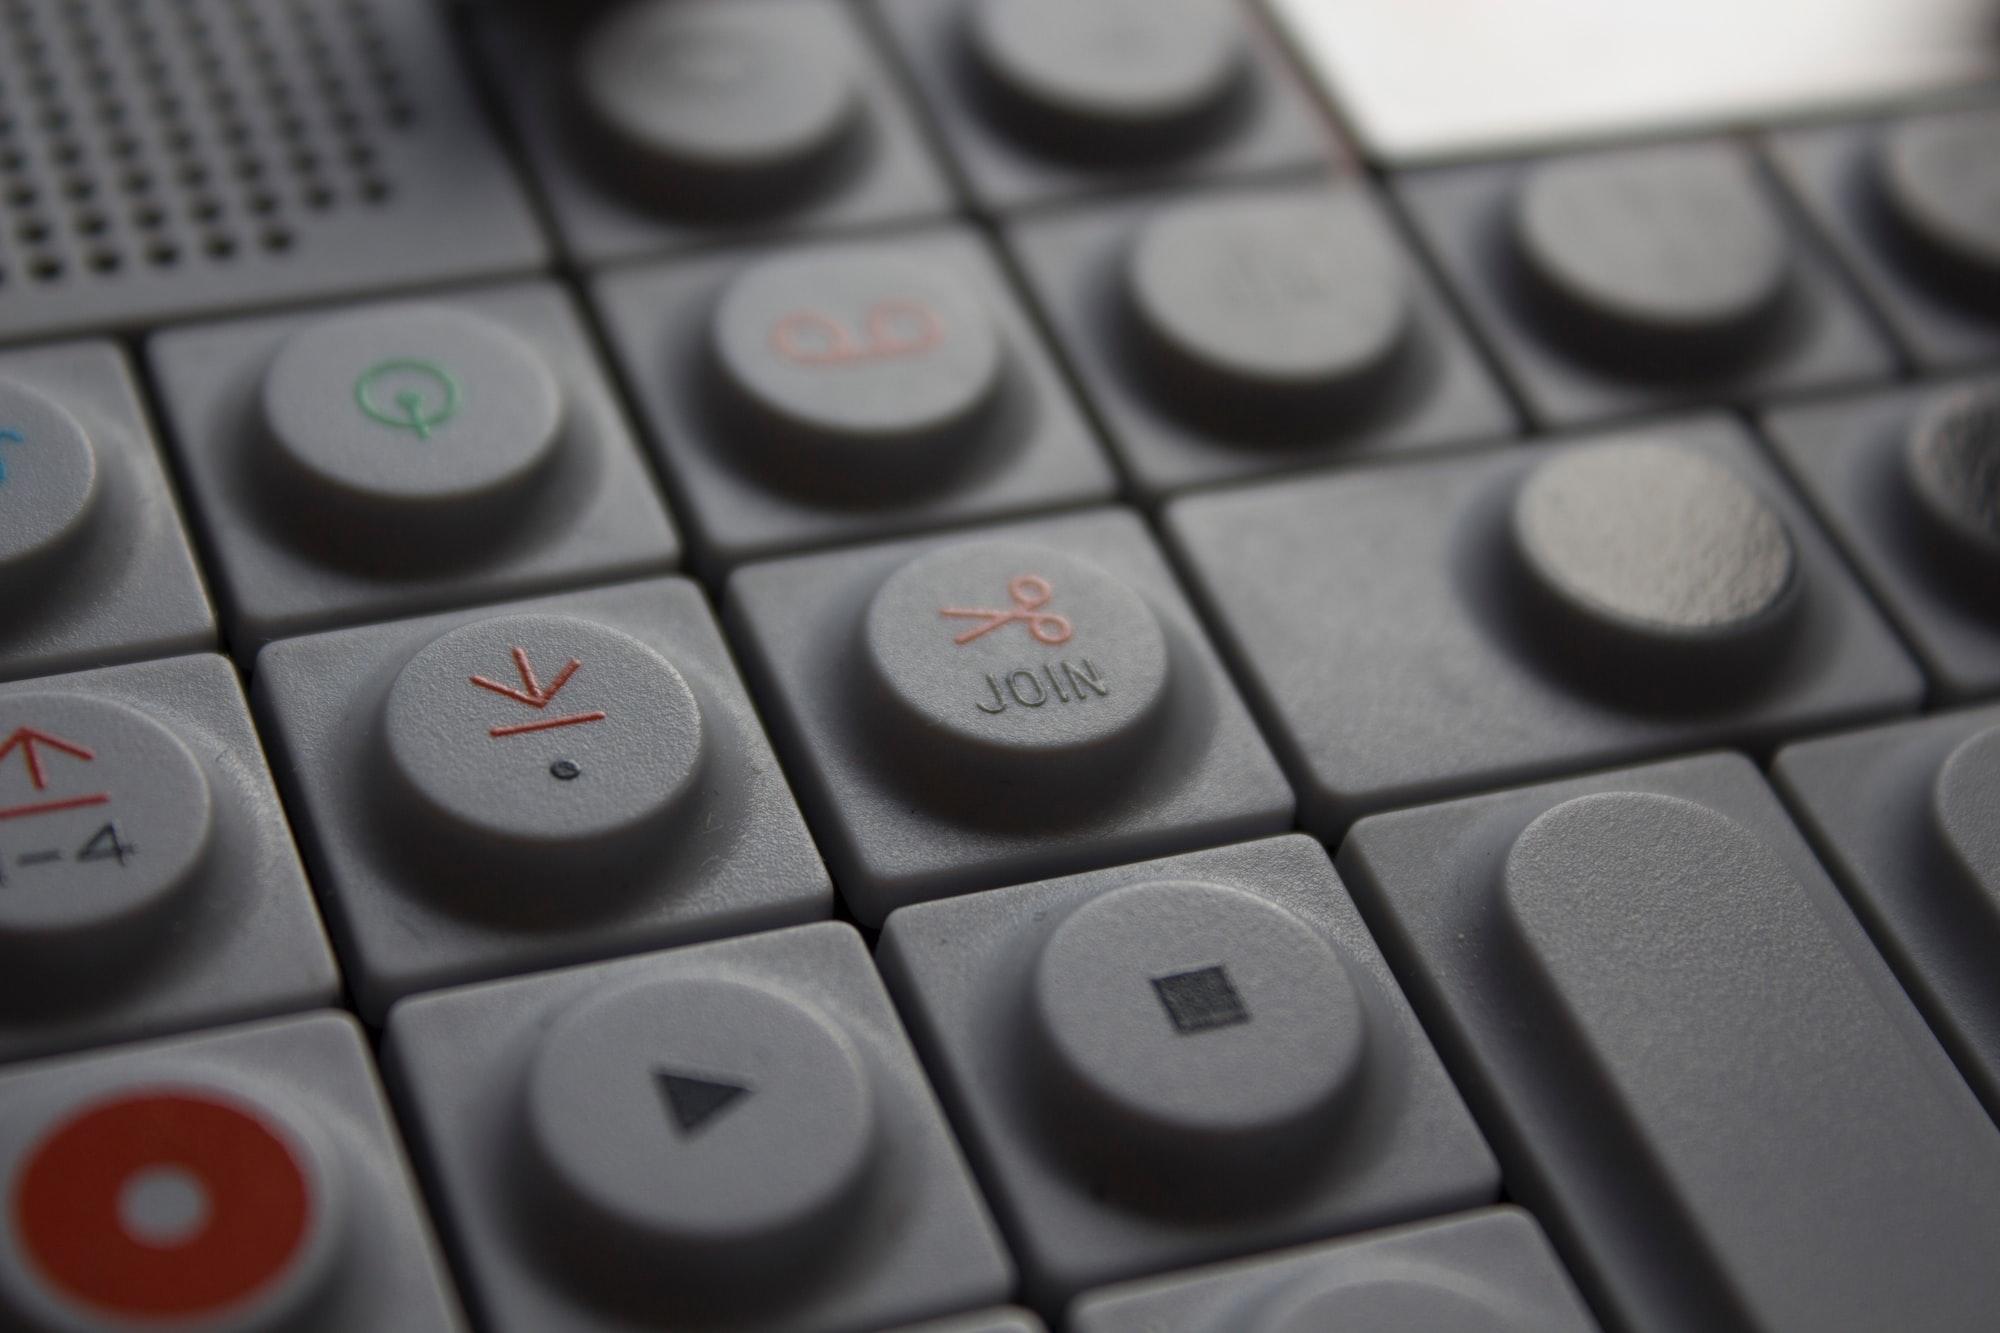 DiY Streamdeck / Macro keyboard